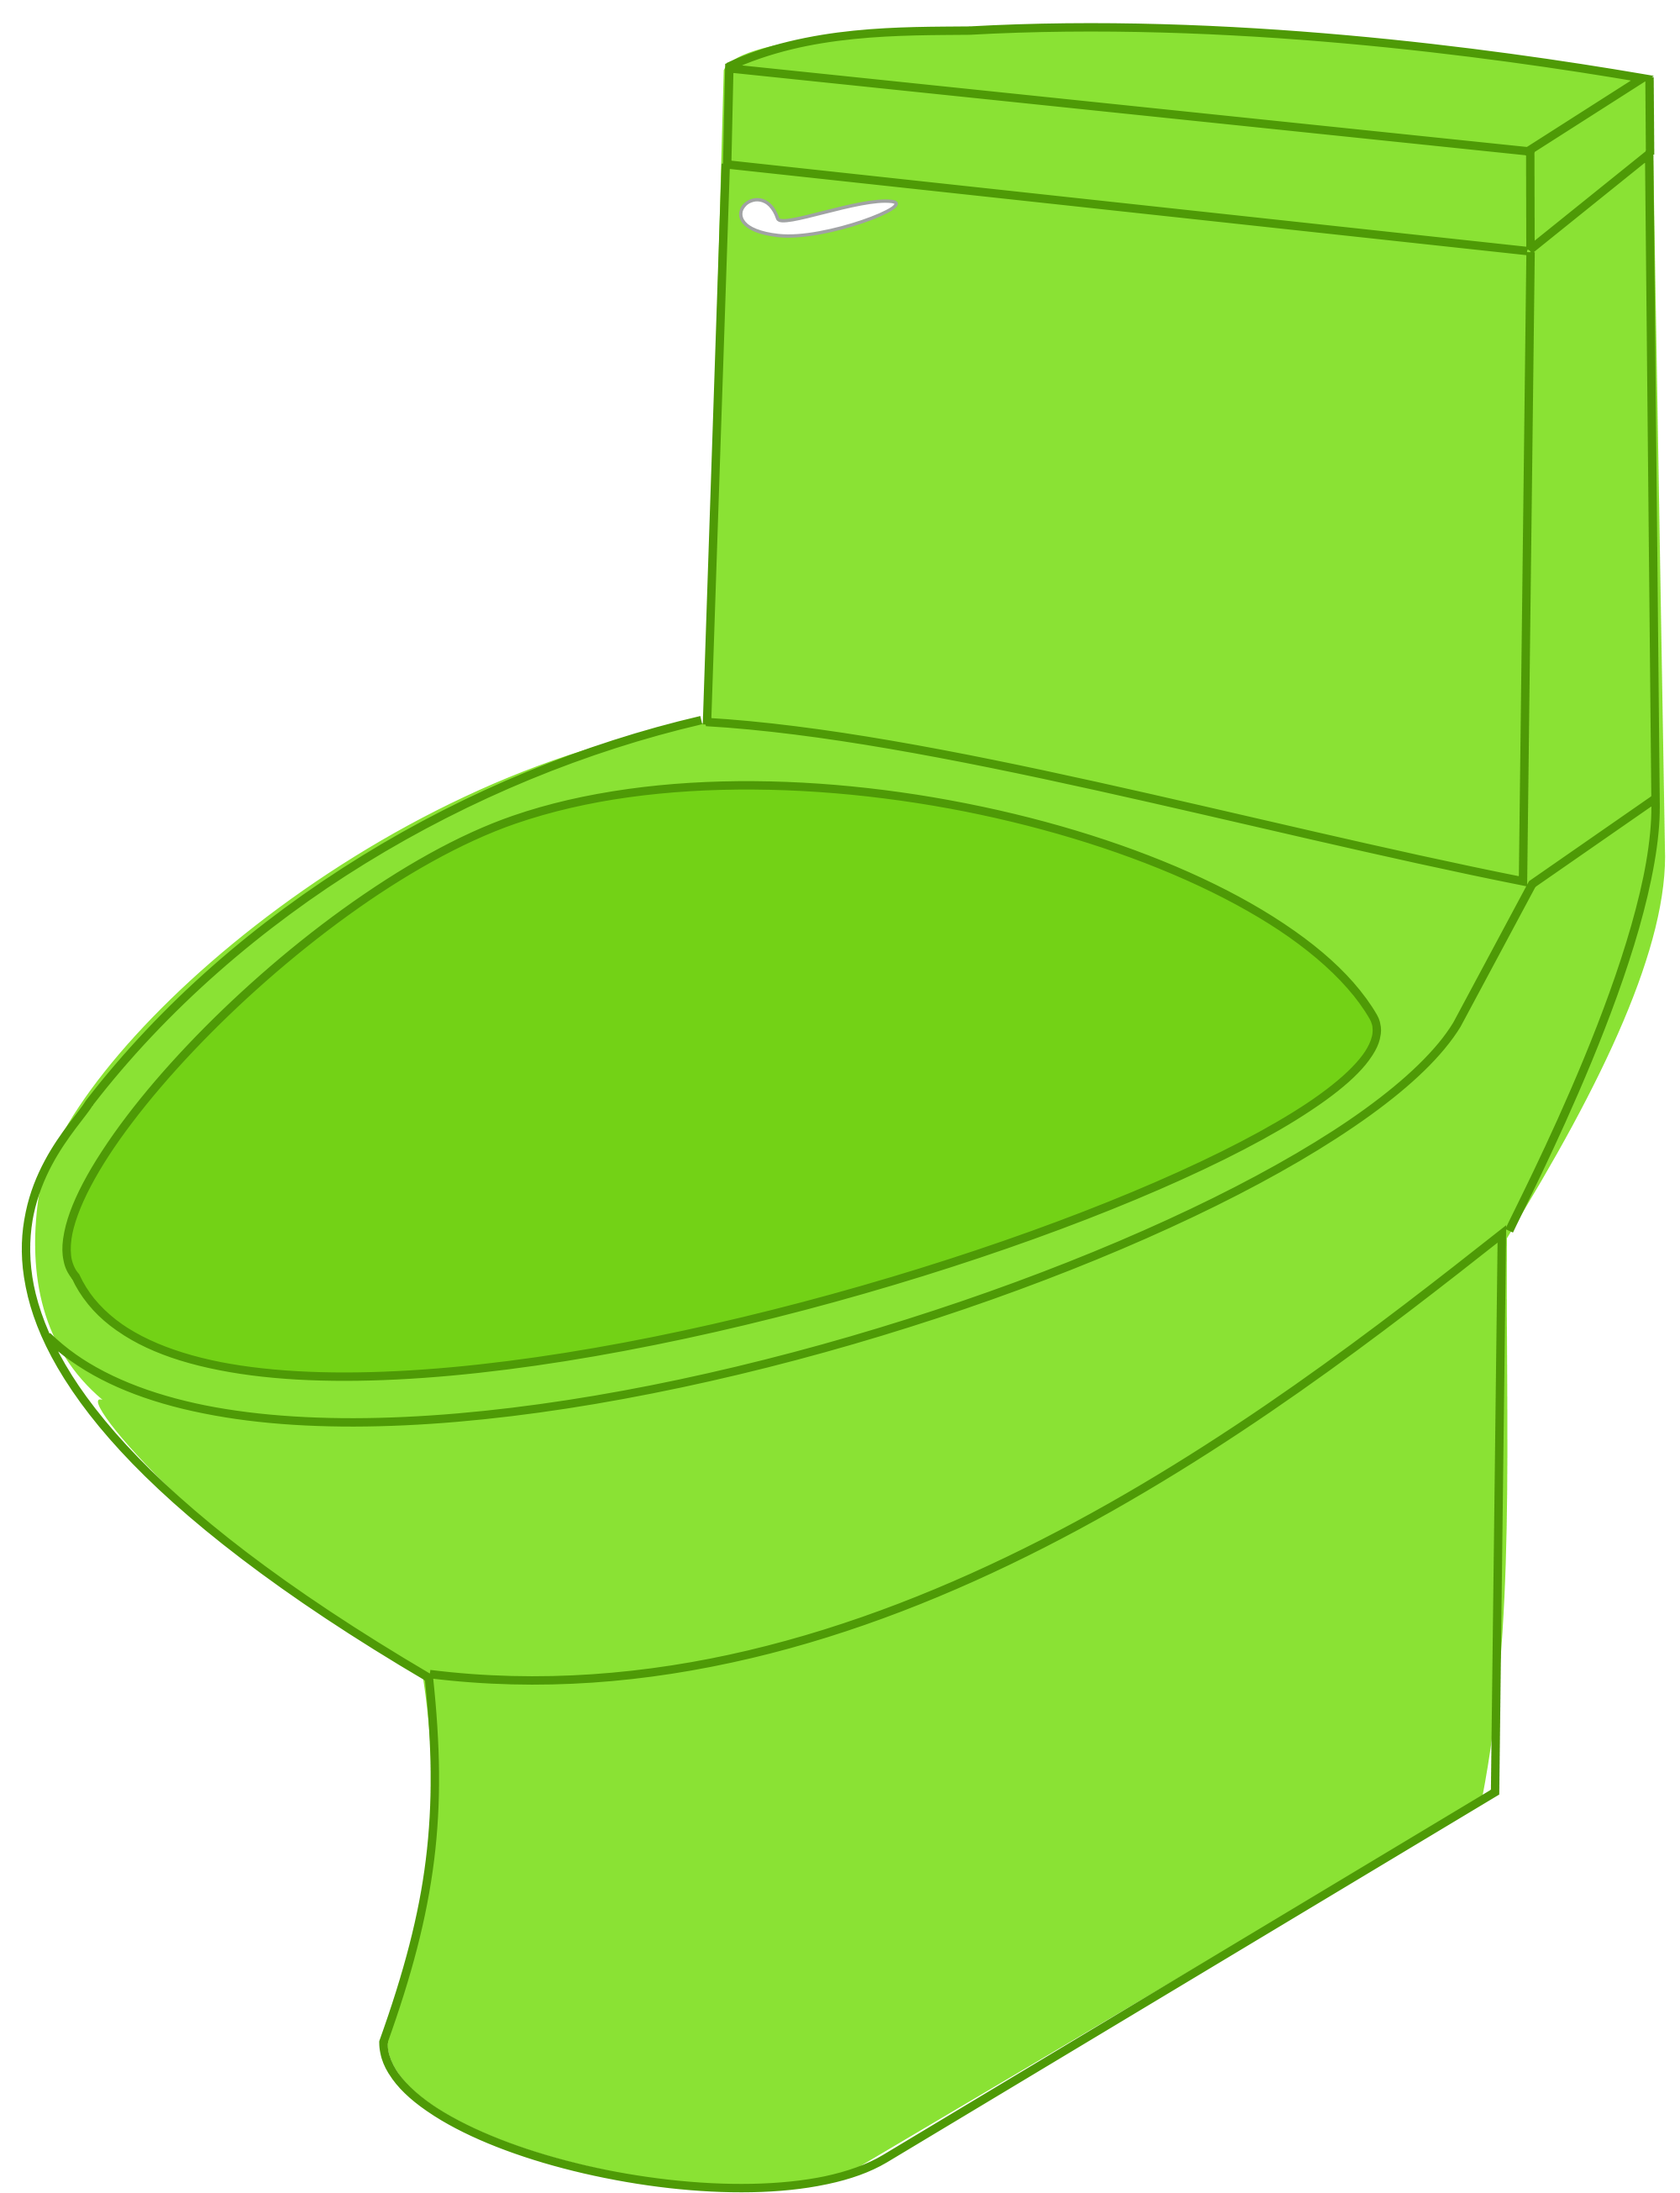 Toilet svg #9, Download drawings